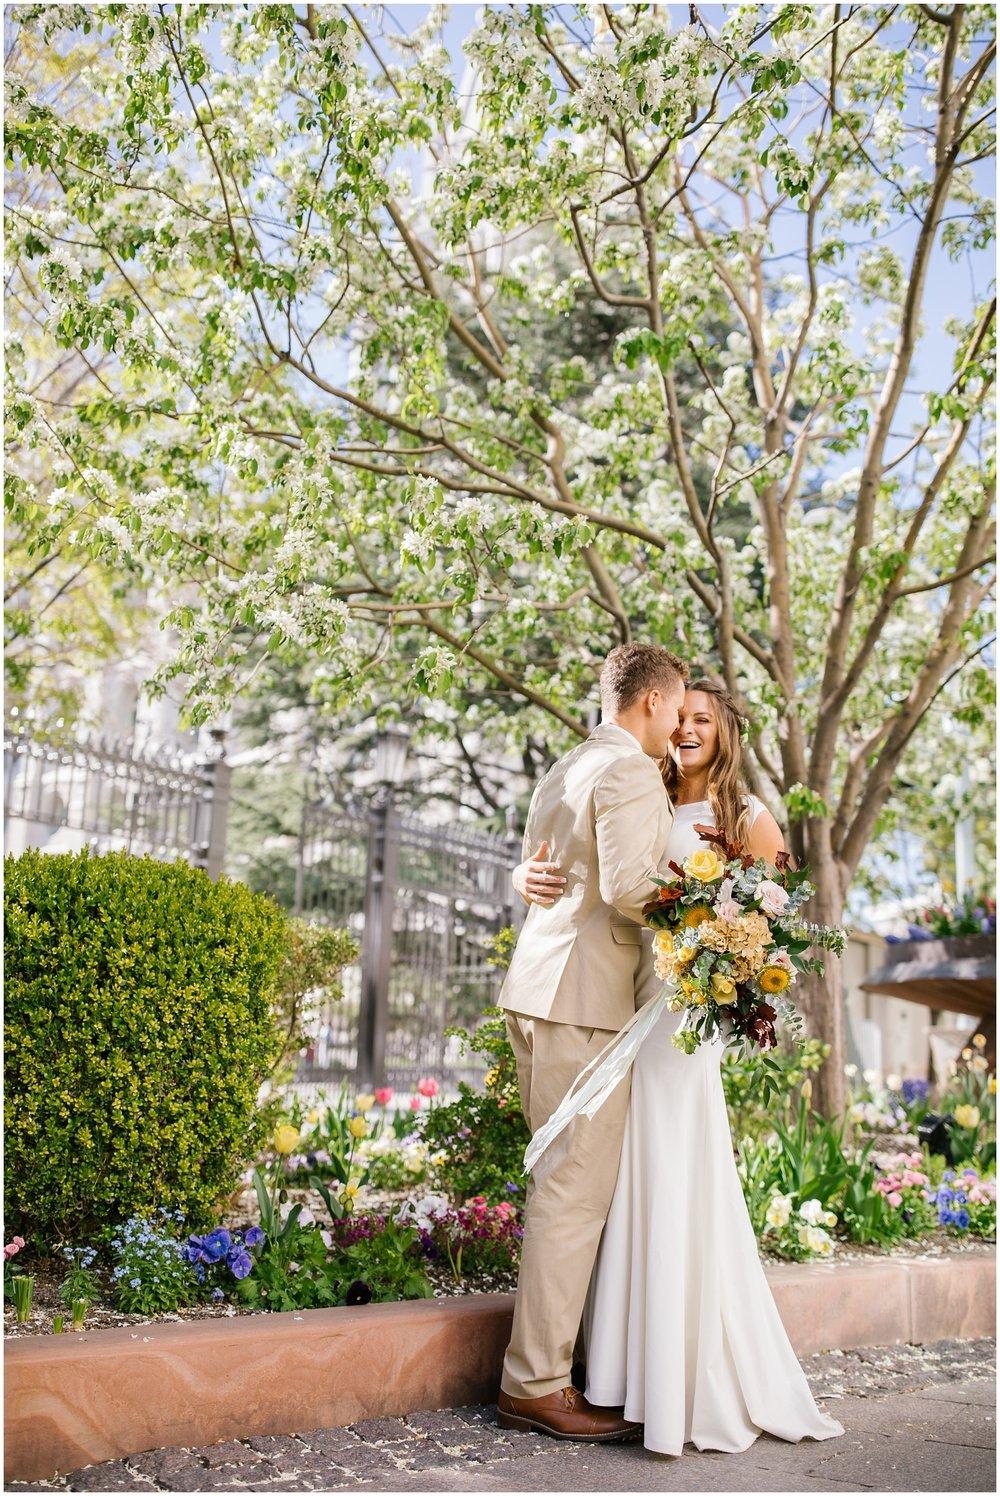 JC-Wedding-193_Lizzie-B-Imagery-Utah-Wedding-Photographer-Park-City-Salt-Lake-City-Temple-Joseph-Smith-Memorial-Building-Empire-Room.jpg